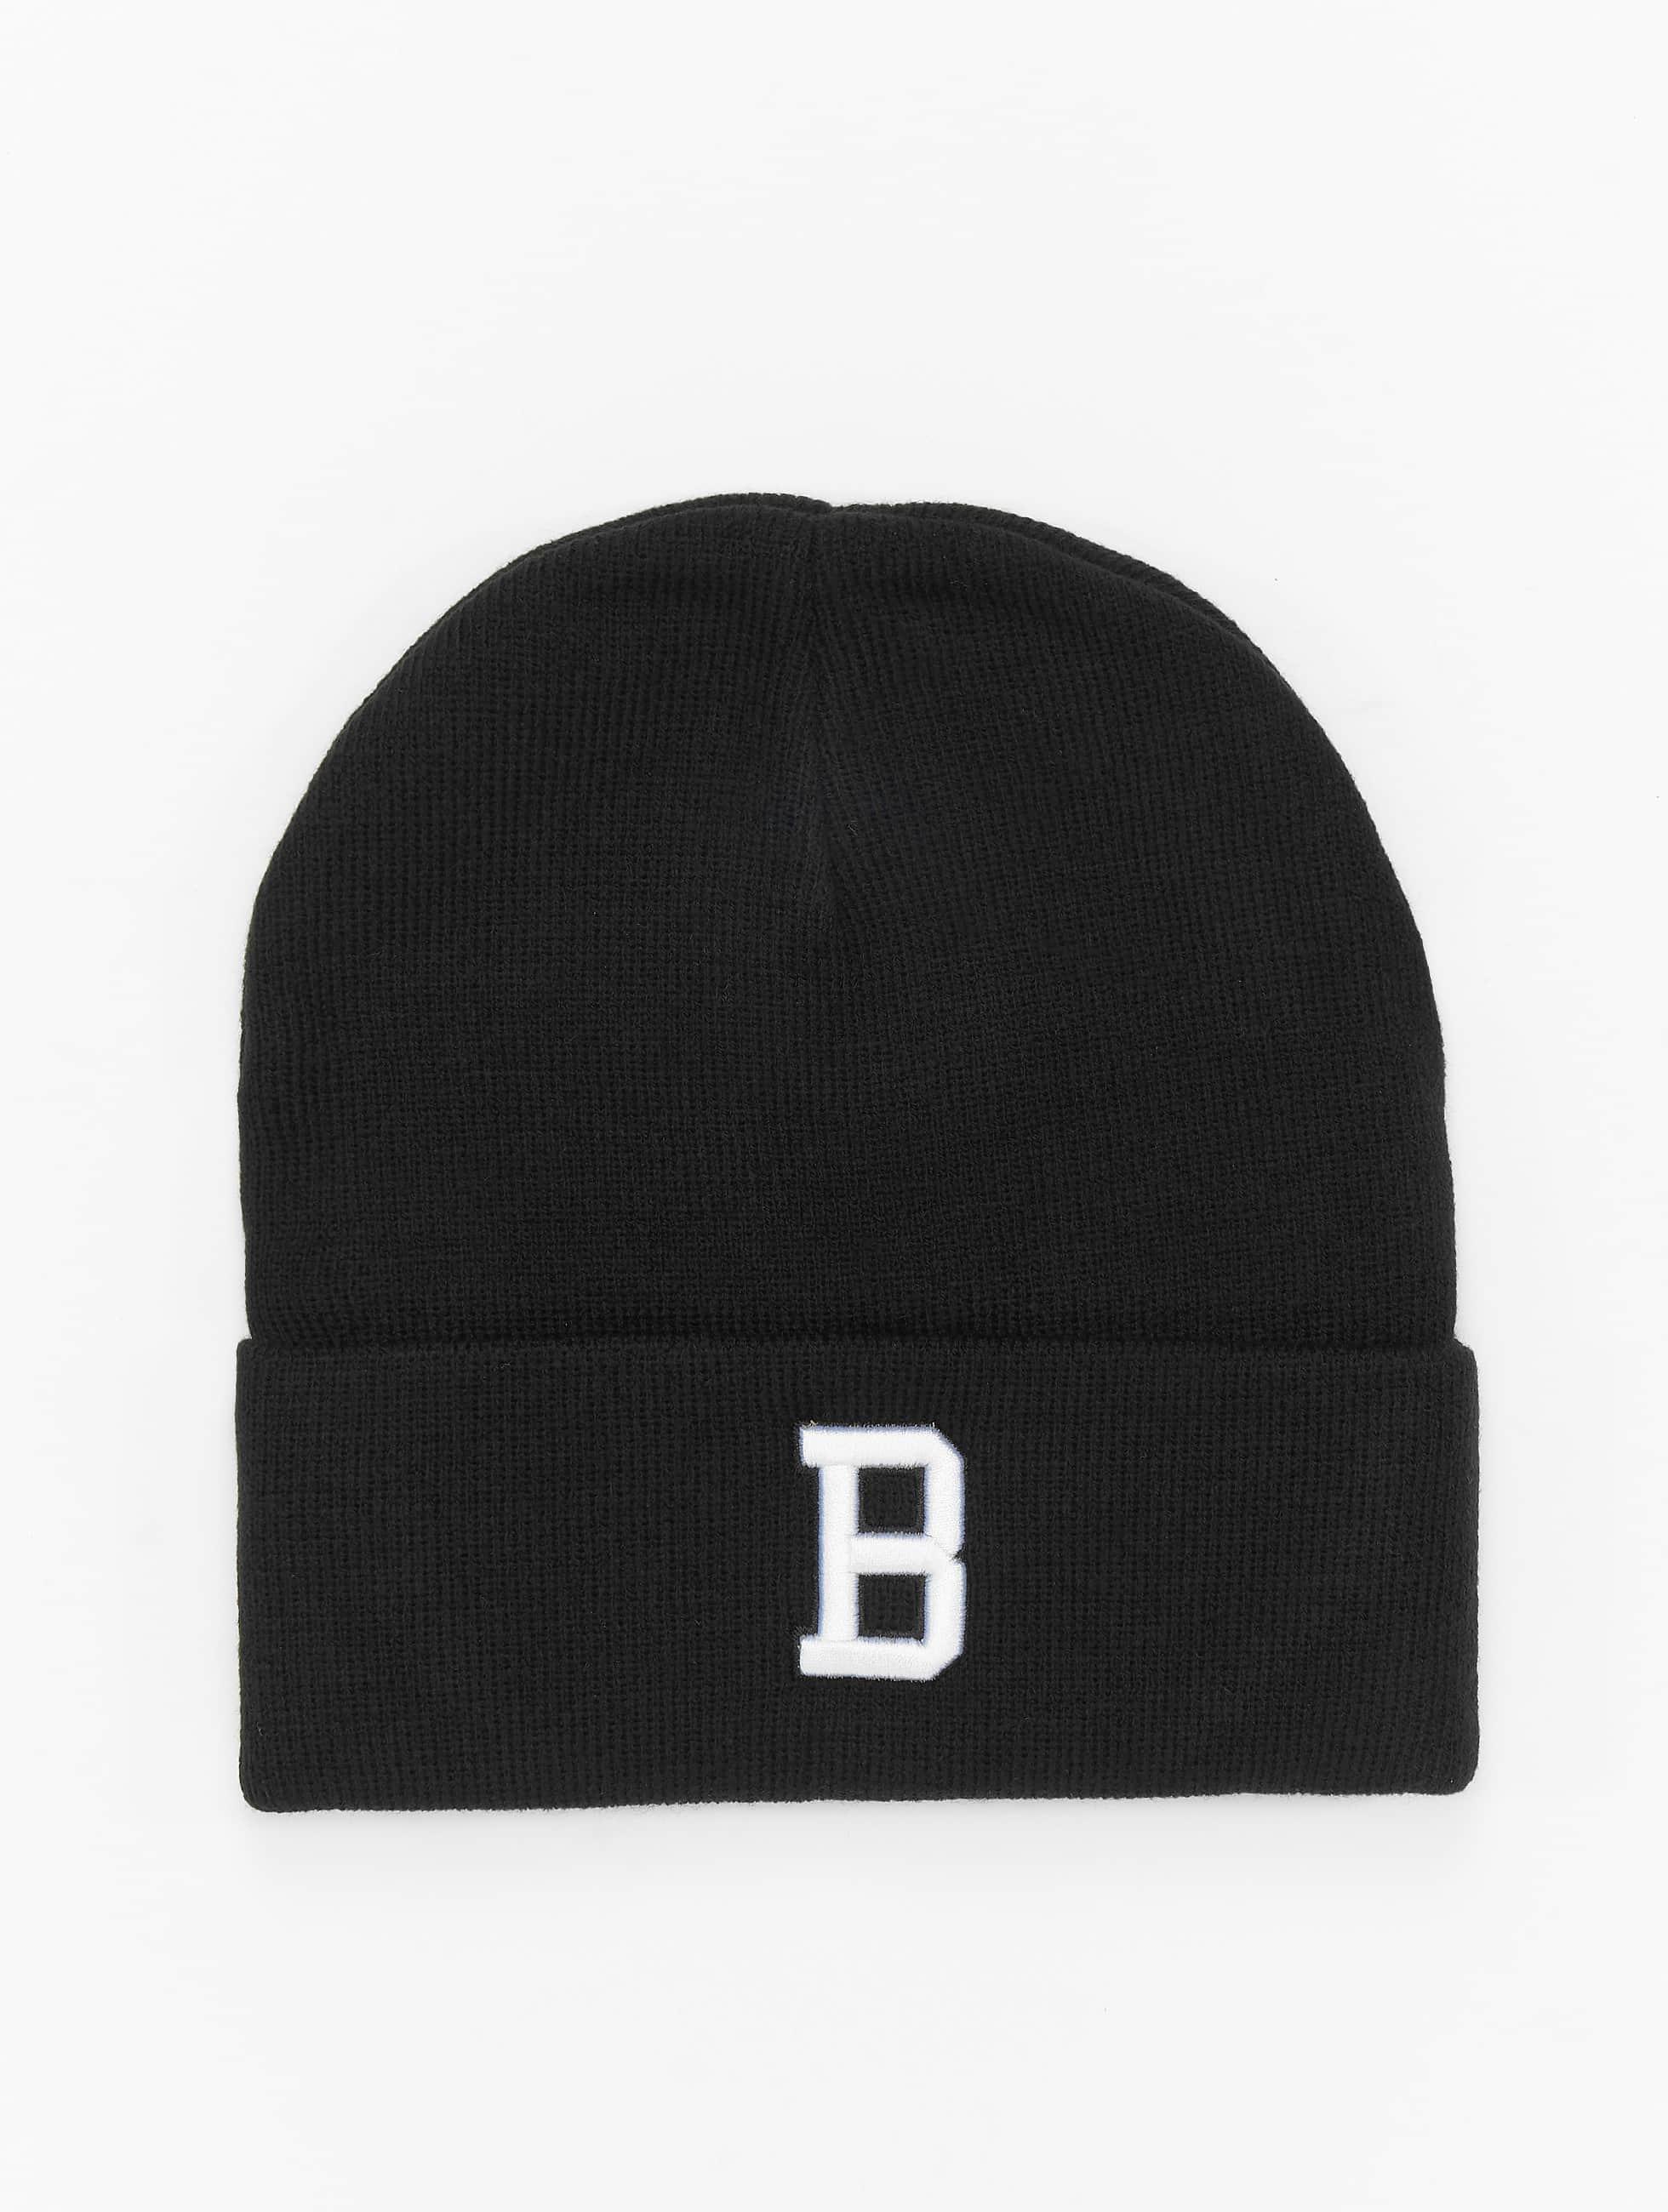 MSTRDS шляпа B Letter черный